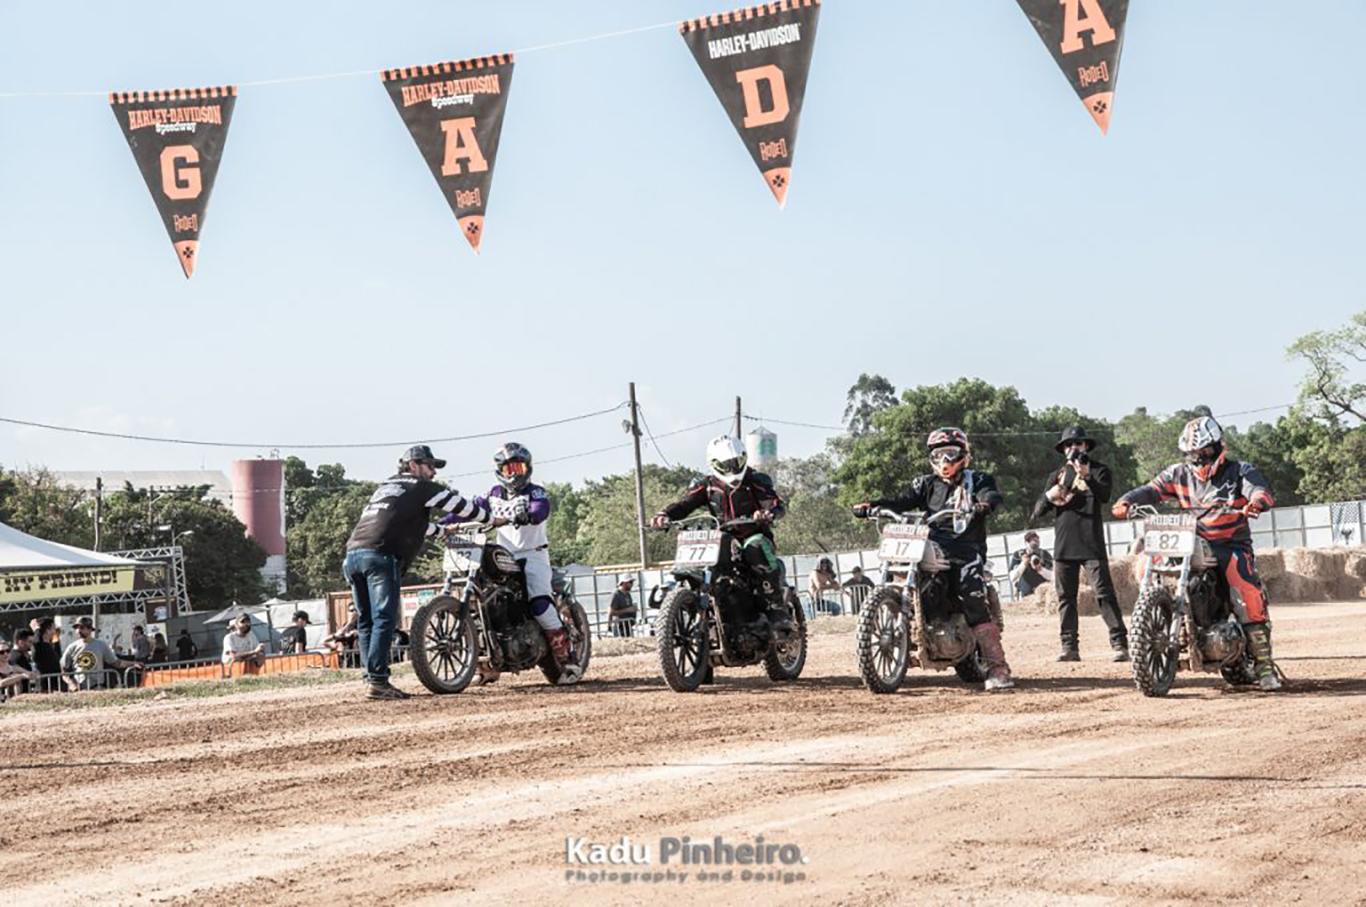 liga-brasileira-de-flat-track-moto-adventure